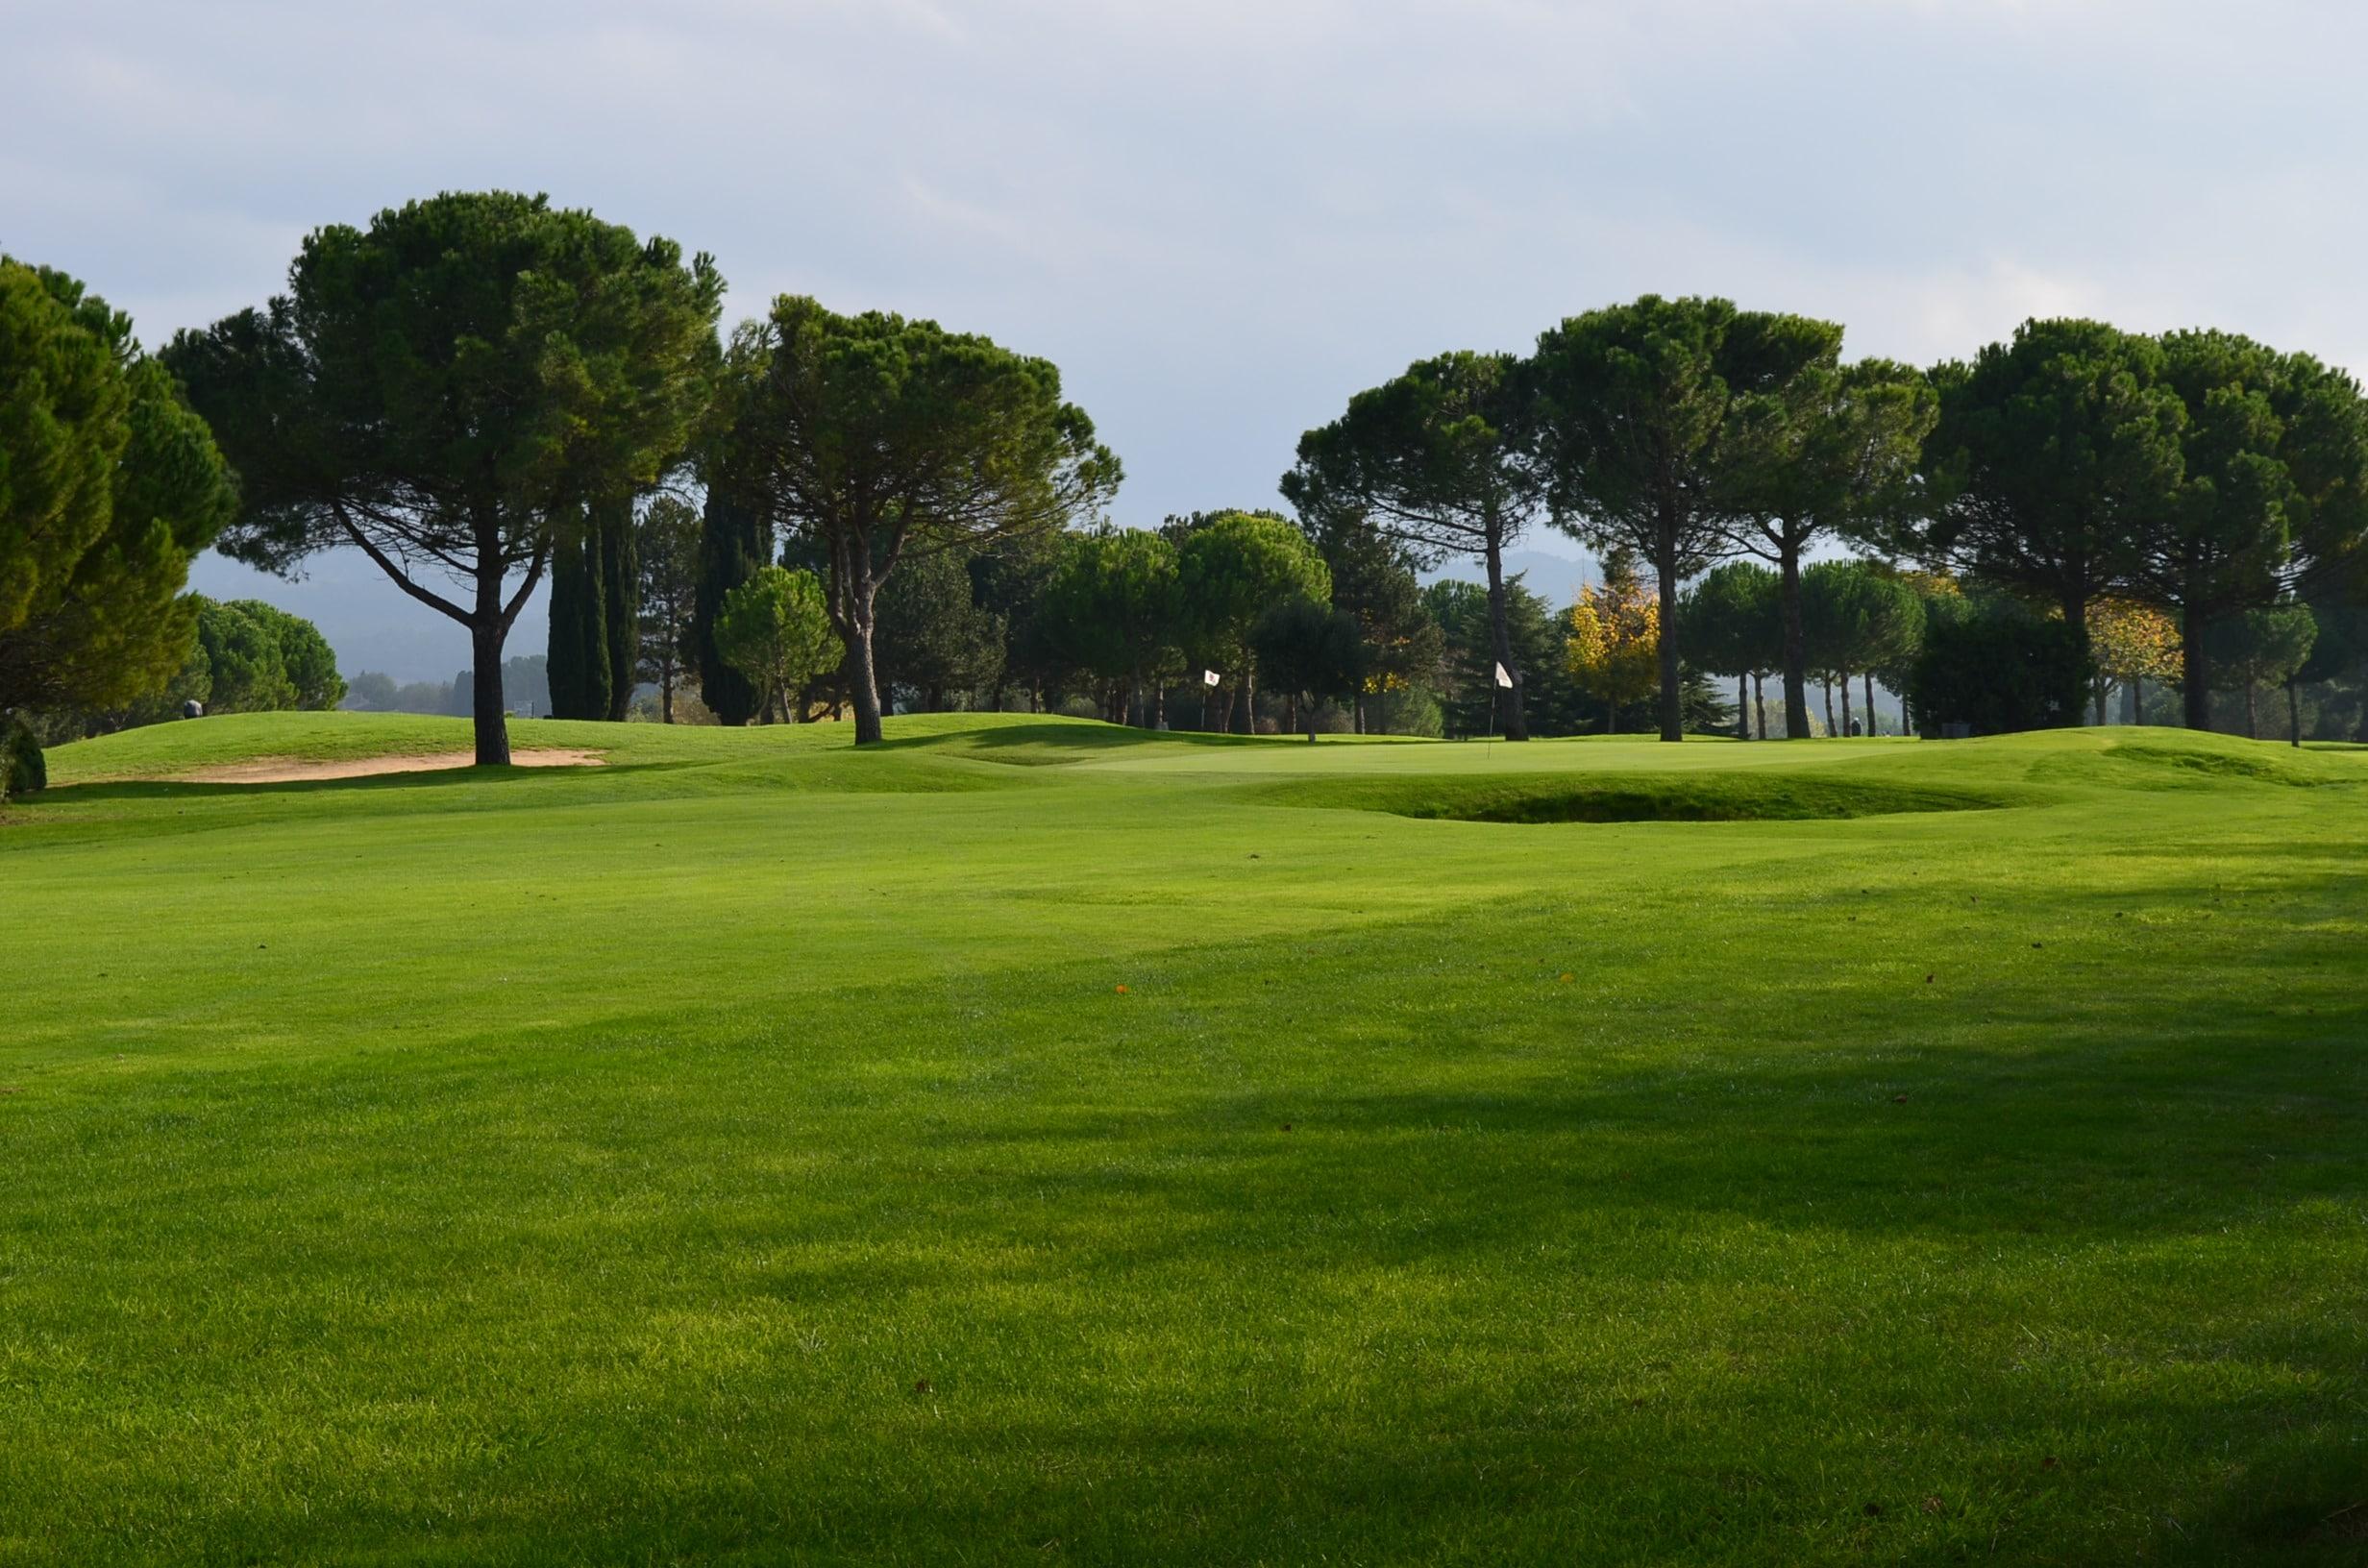 golf club de carcassonne golf in south of france next golf. Black Bedroom Furniture Sets. Home Design Ideas